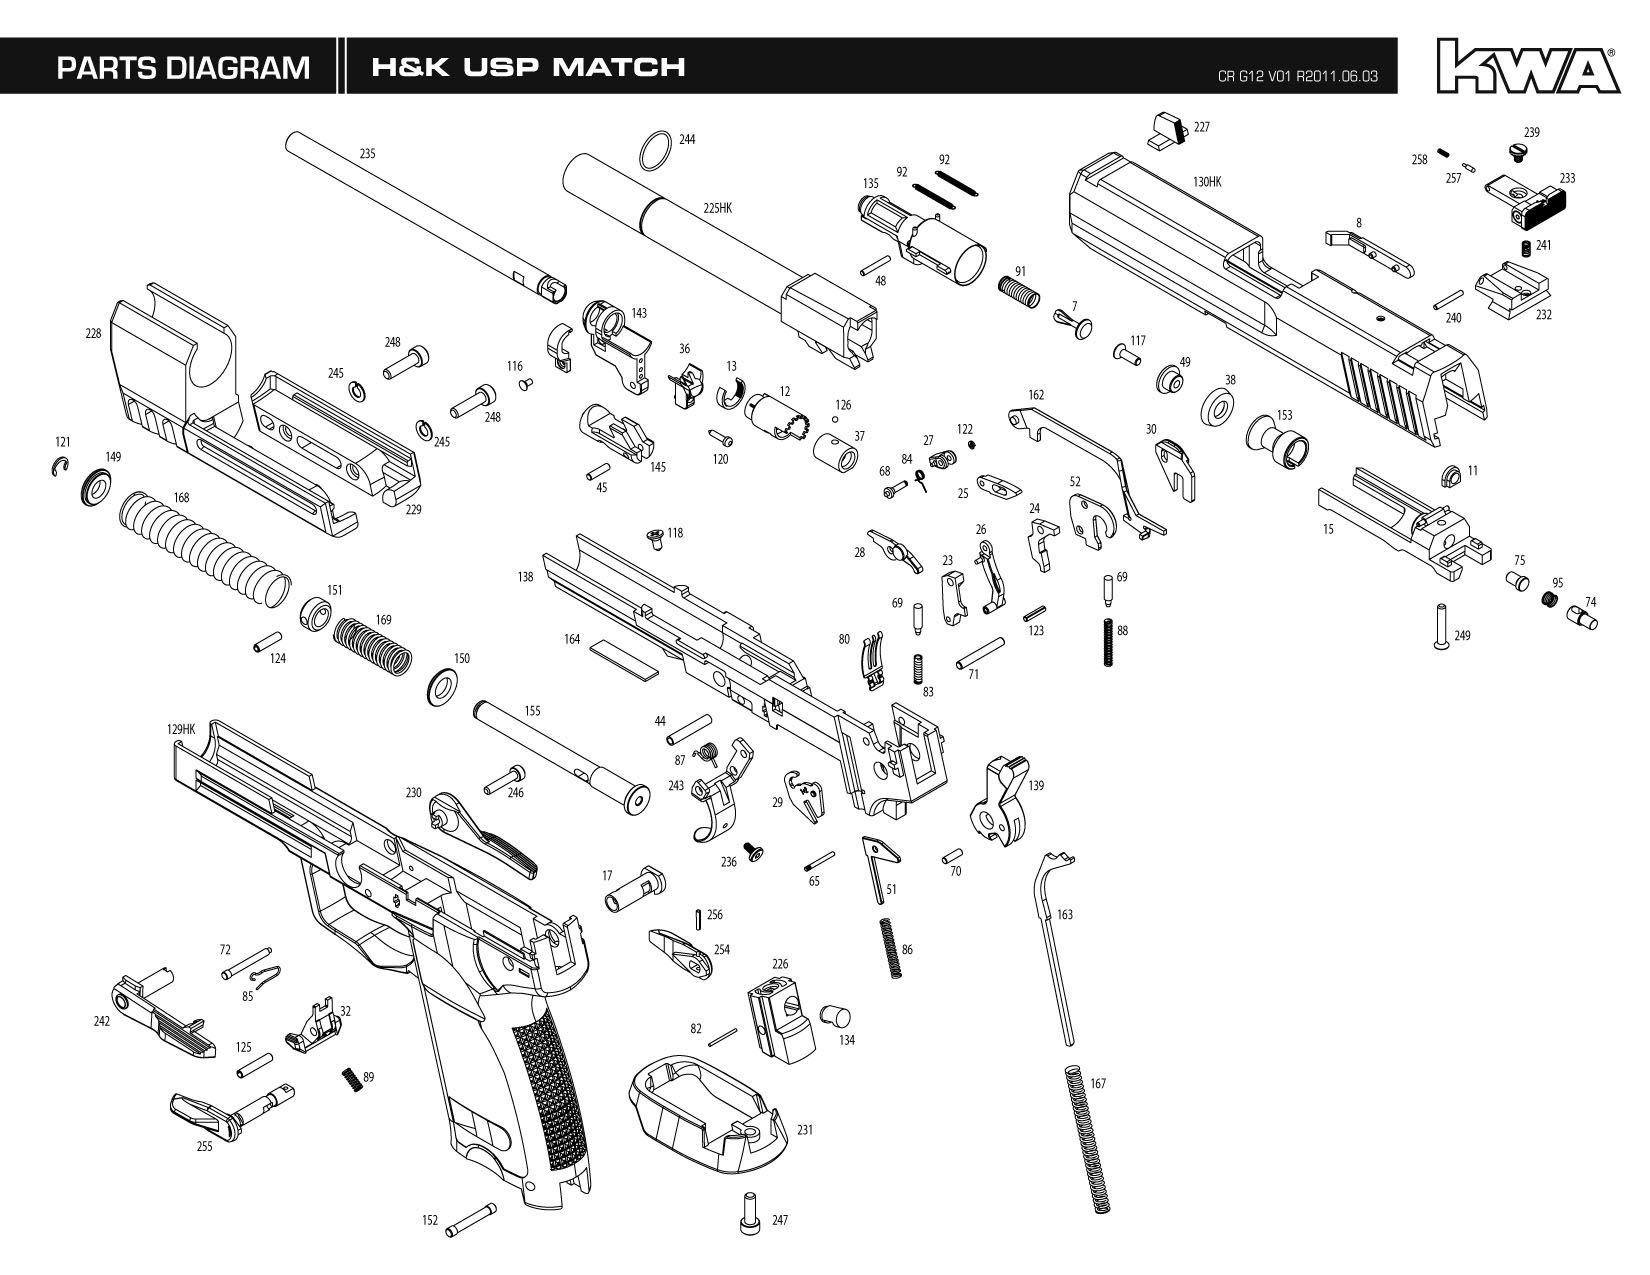 Exploded Gun Diagrams Hk Usp 45